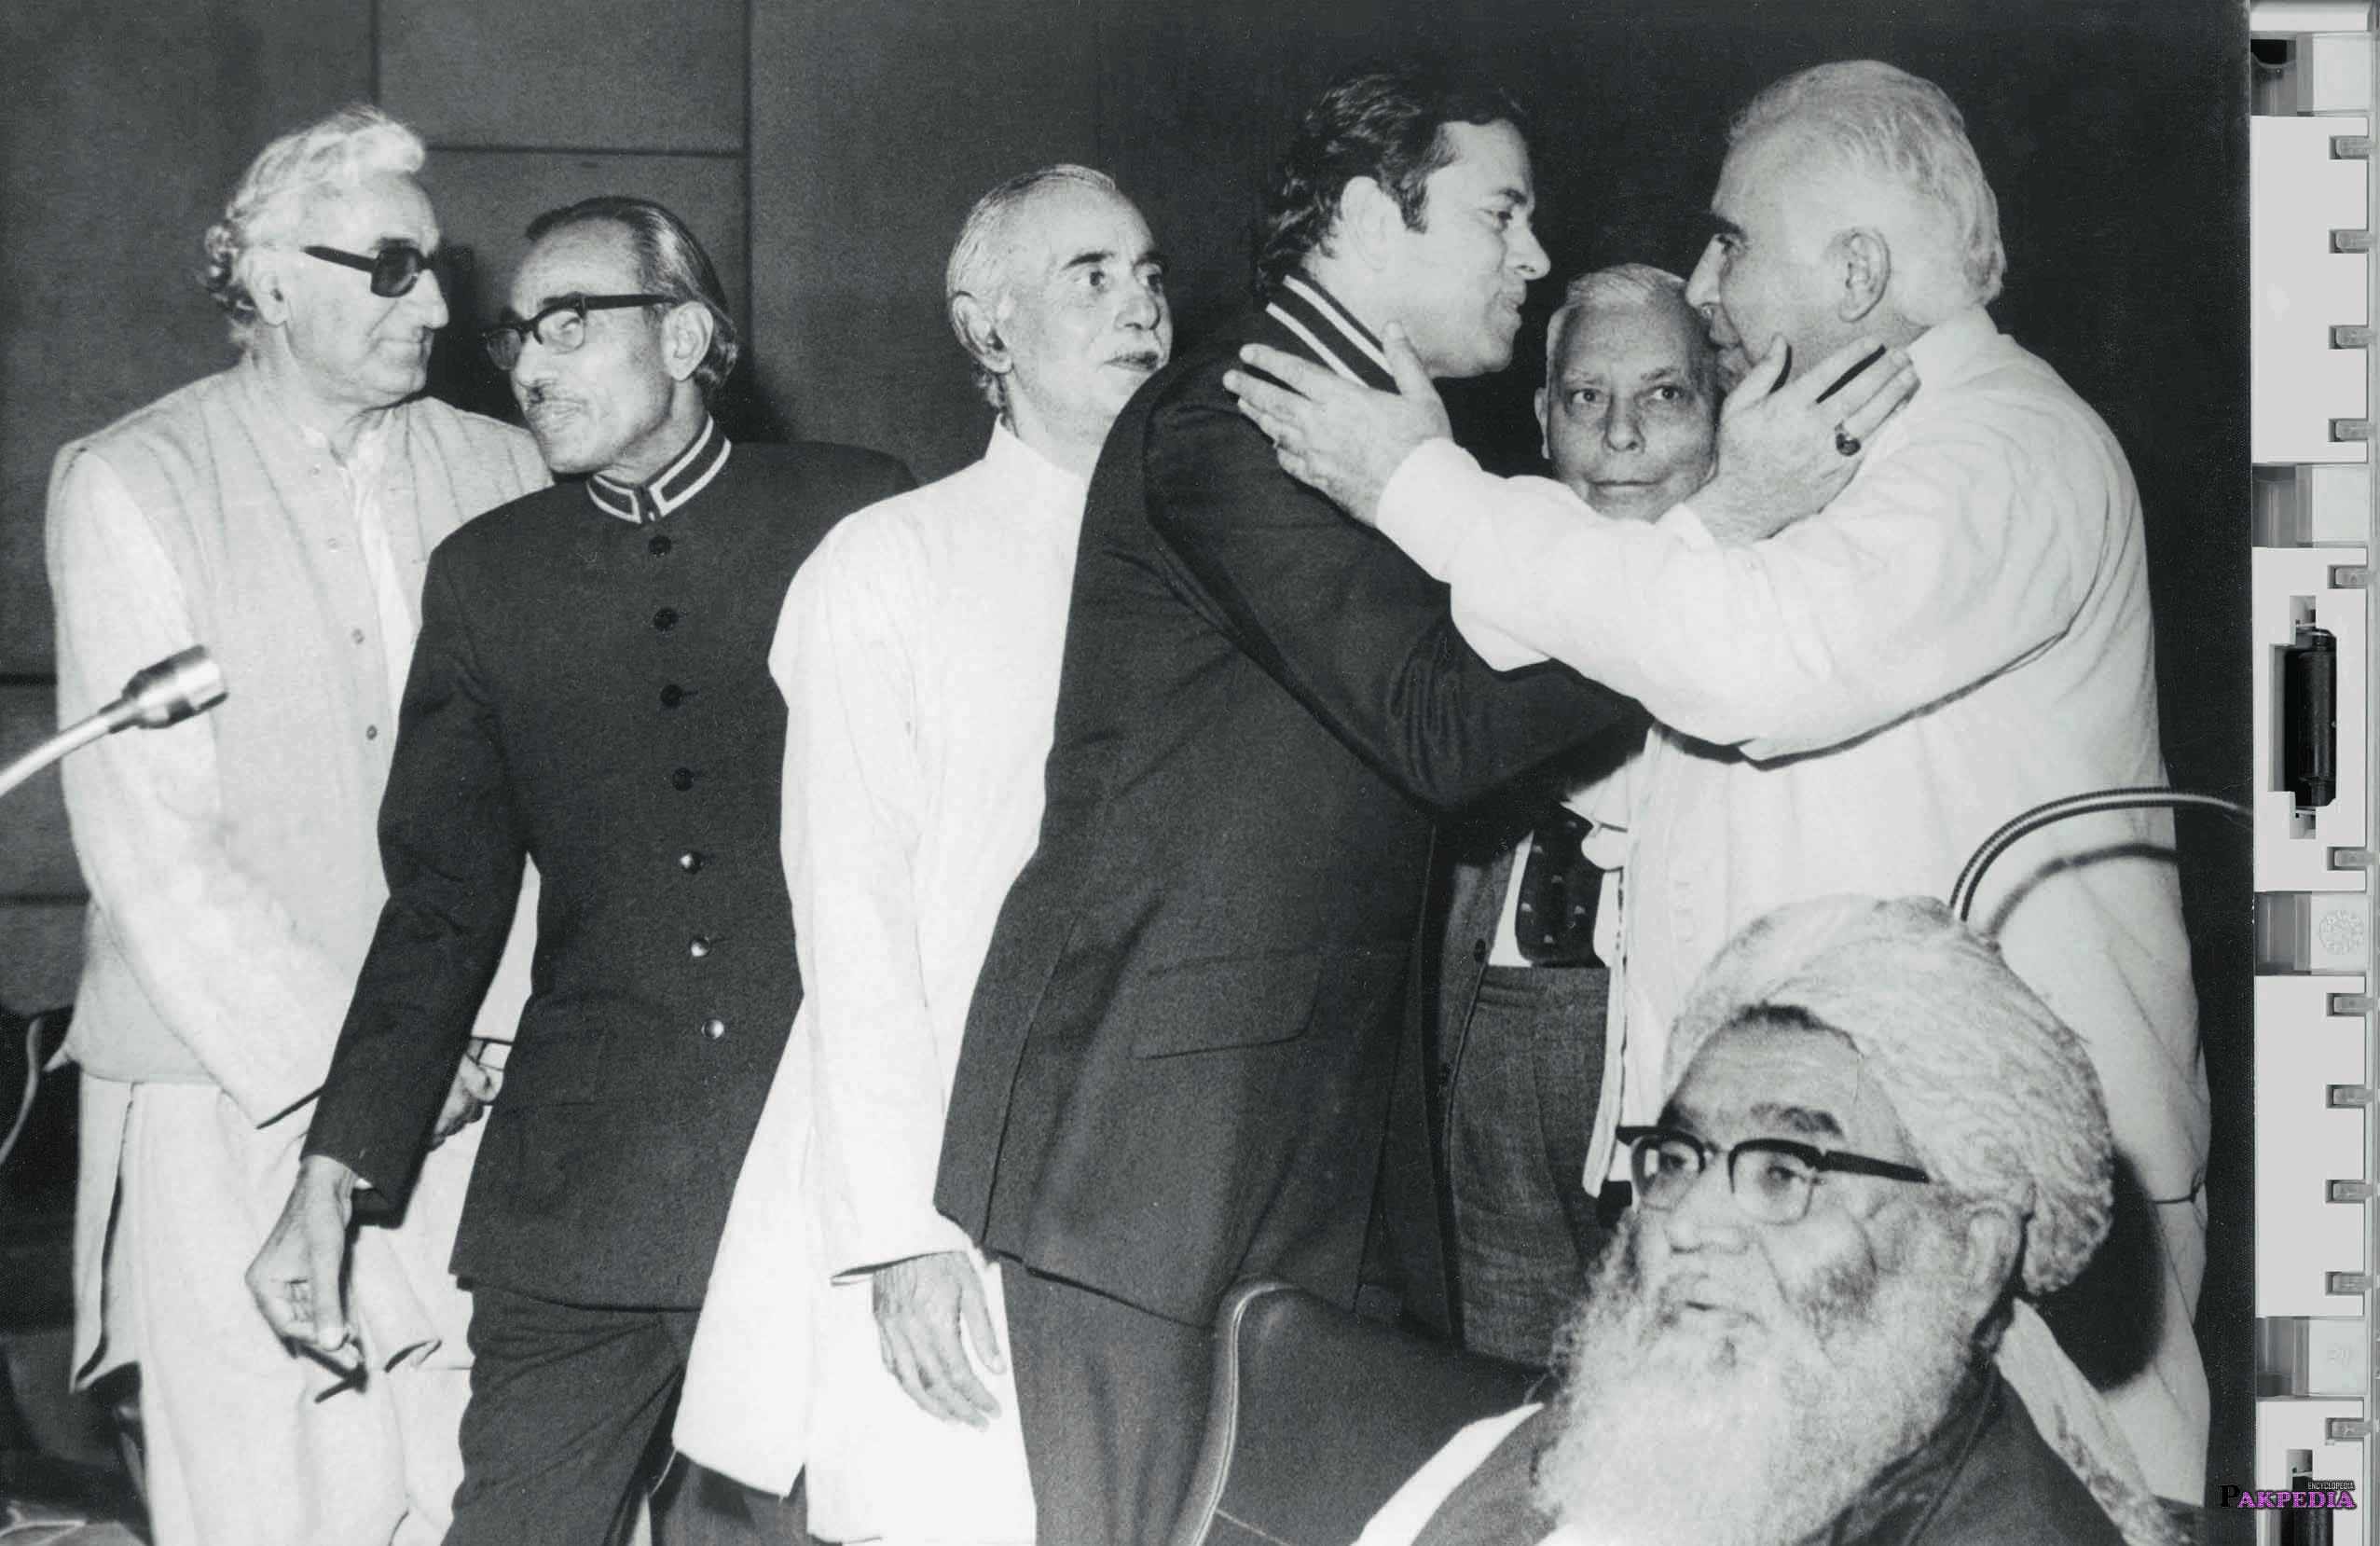 An old photo of Abdul Jamil Khan